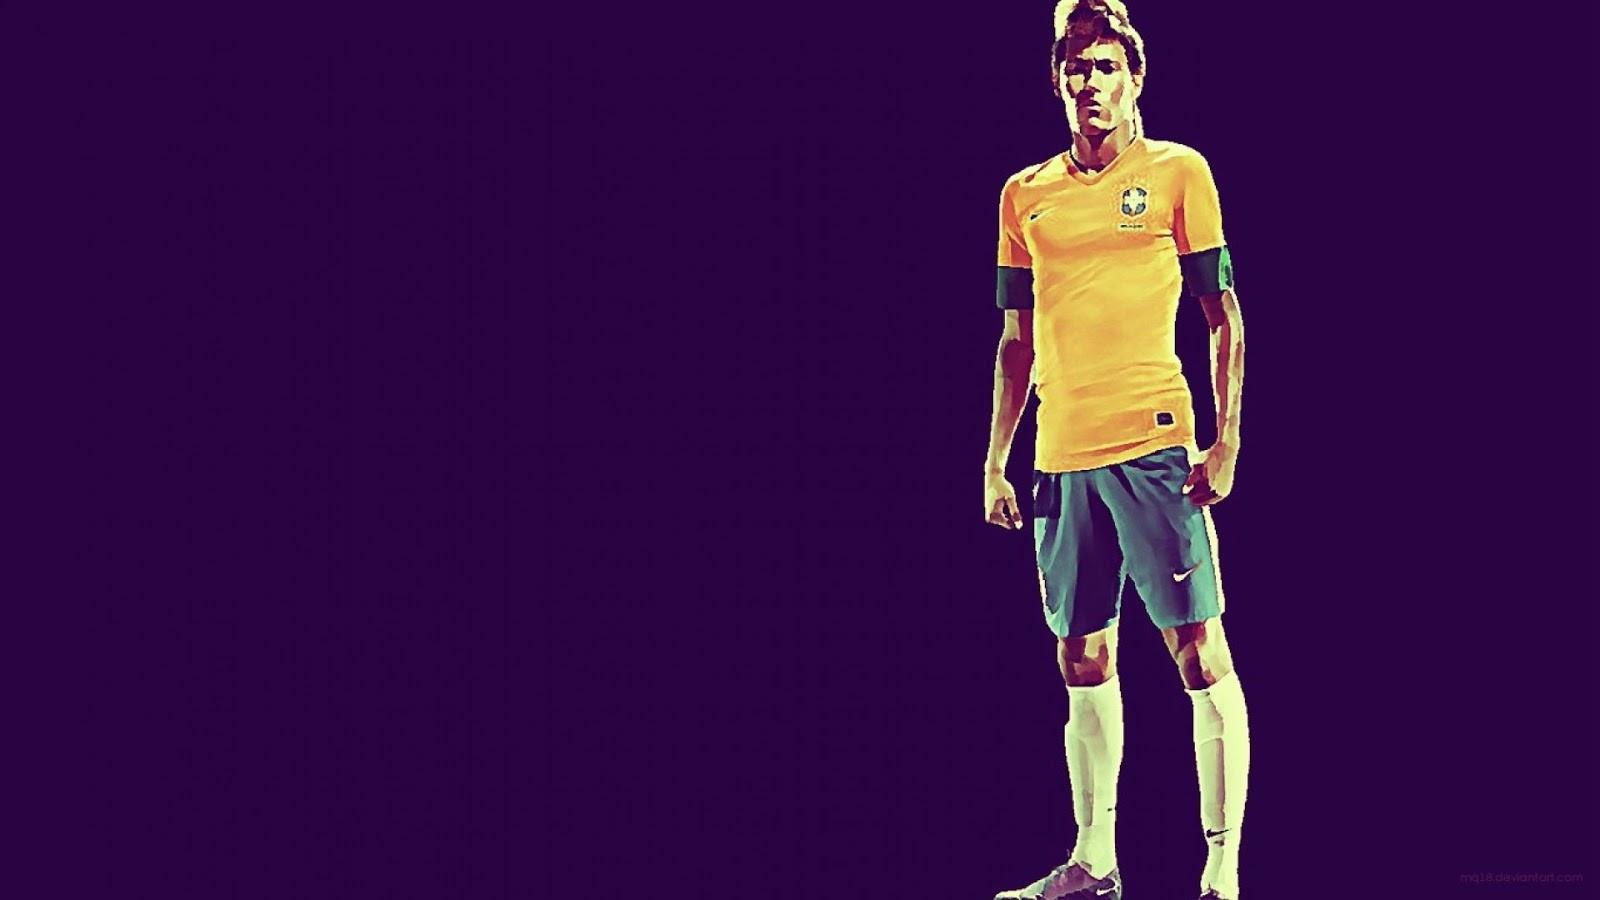 Hd wallpaper neymar - Wallpapers Neymar Jr The Best Bacelona Football Player Hd Wallpapers